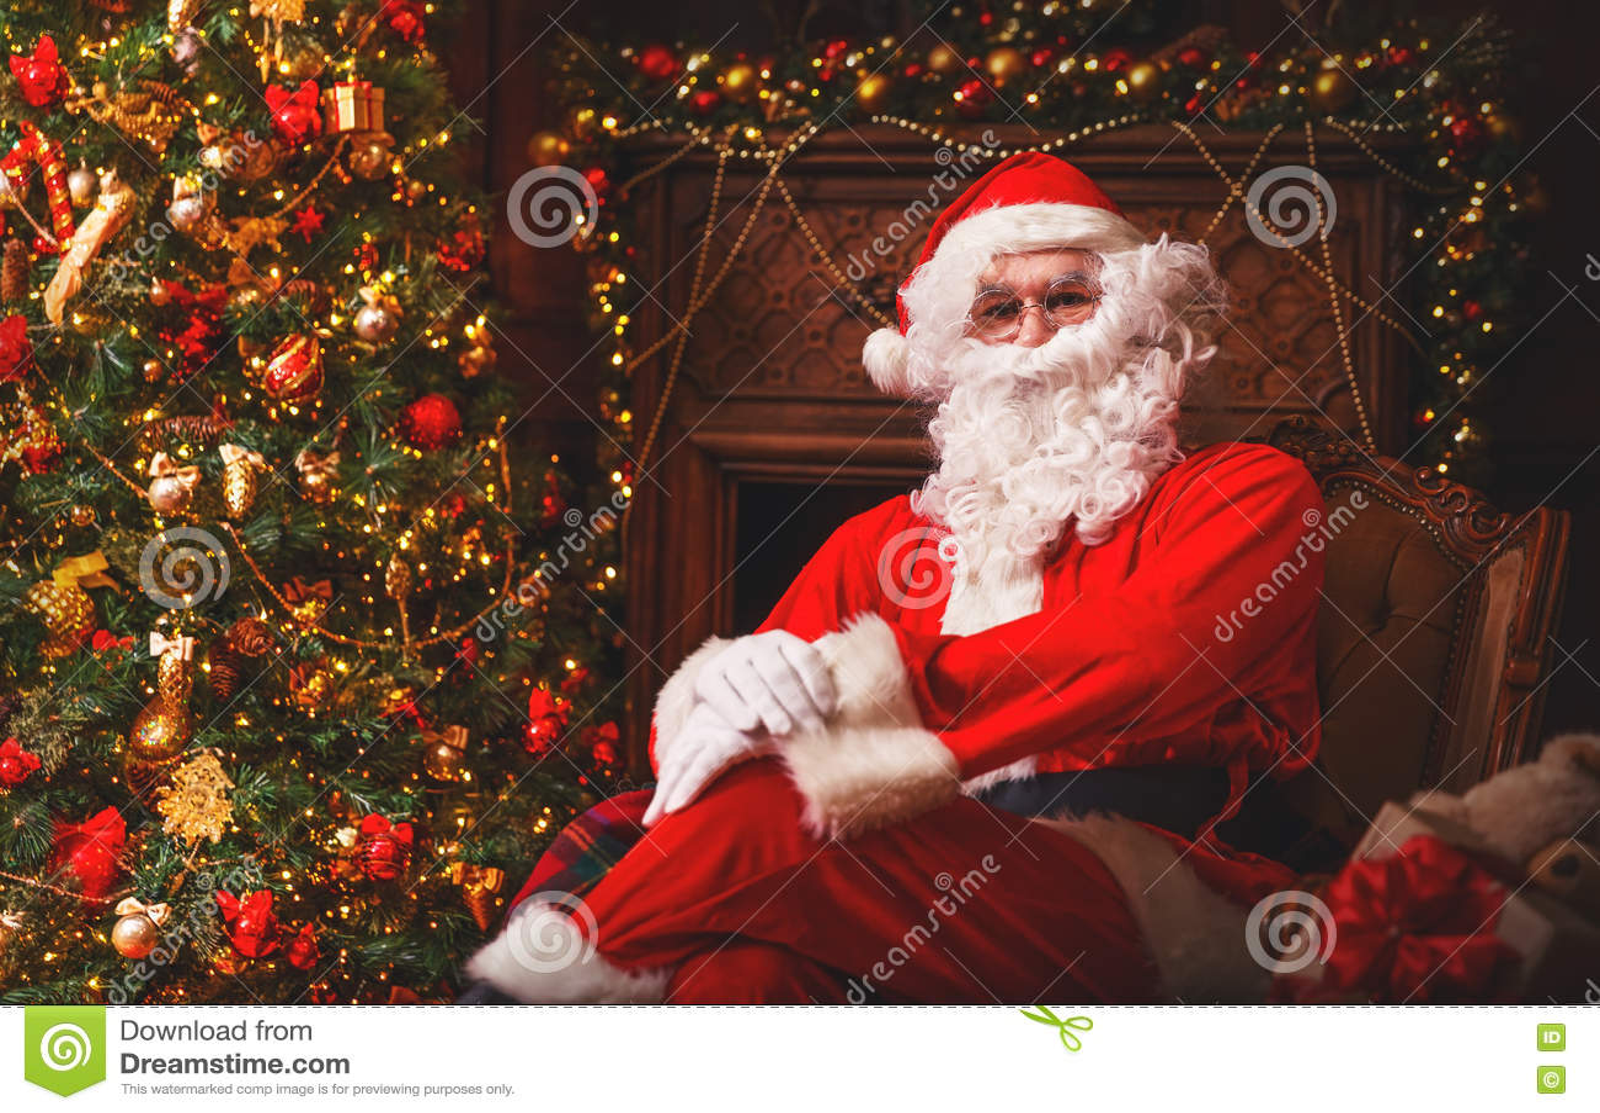 Santa claus with gifts around christmas tree stock photo